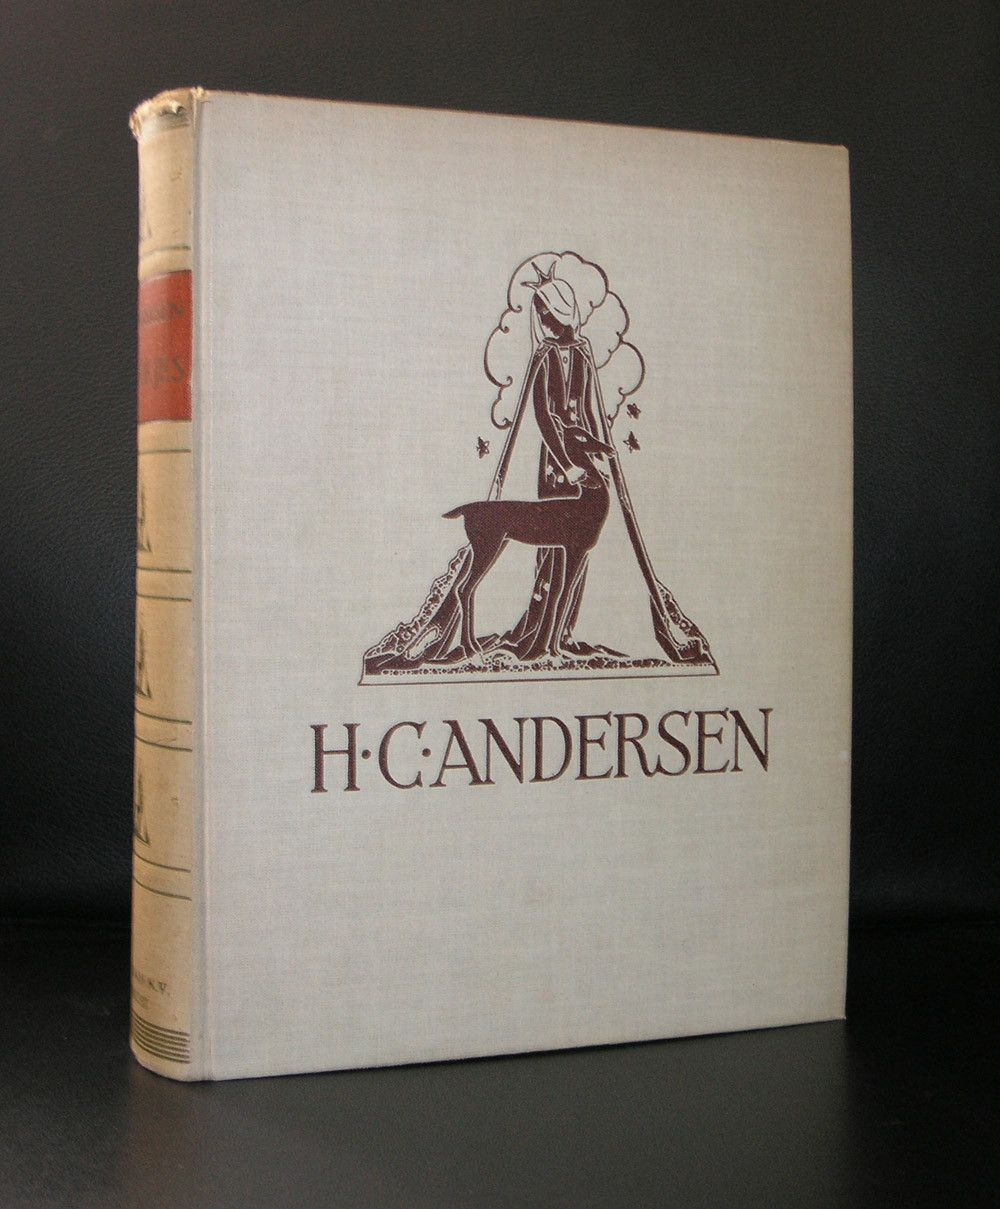 Rie Cramer # H.C. ANDERSEN SPROOKJES#1950, nm